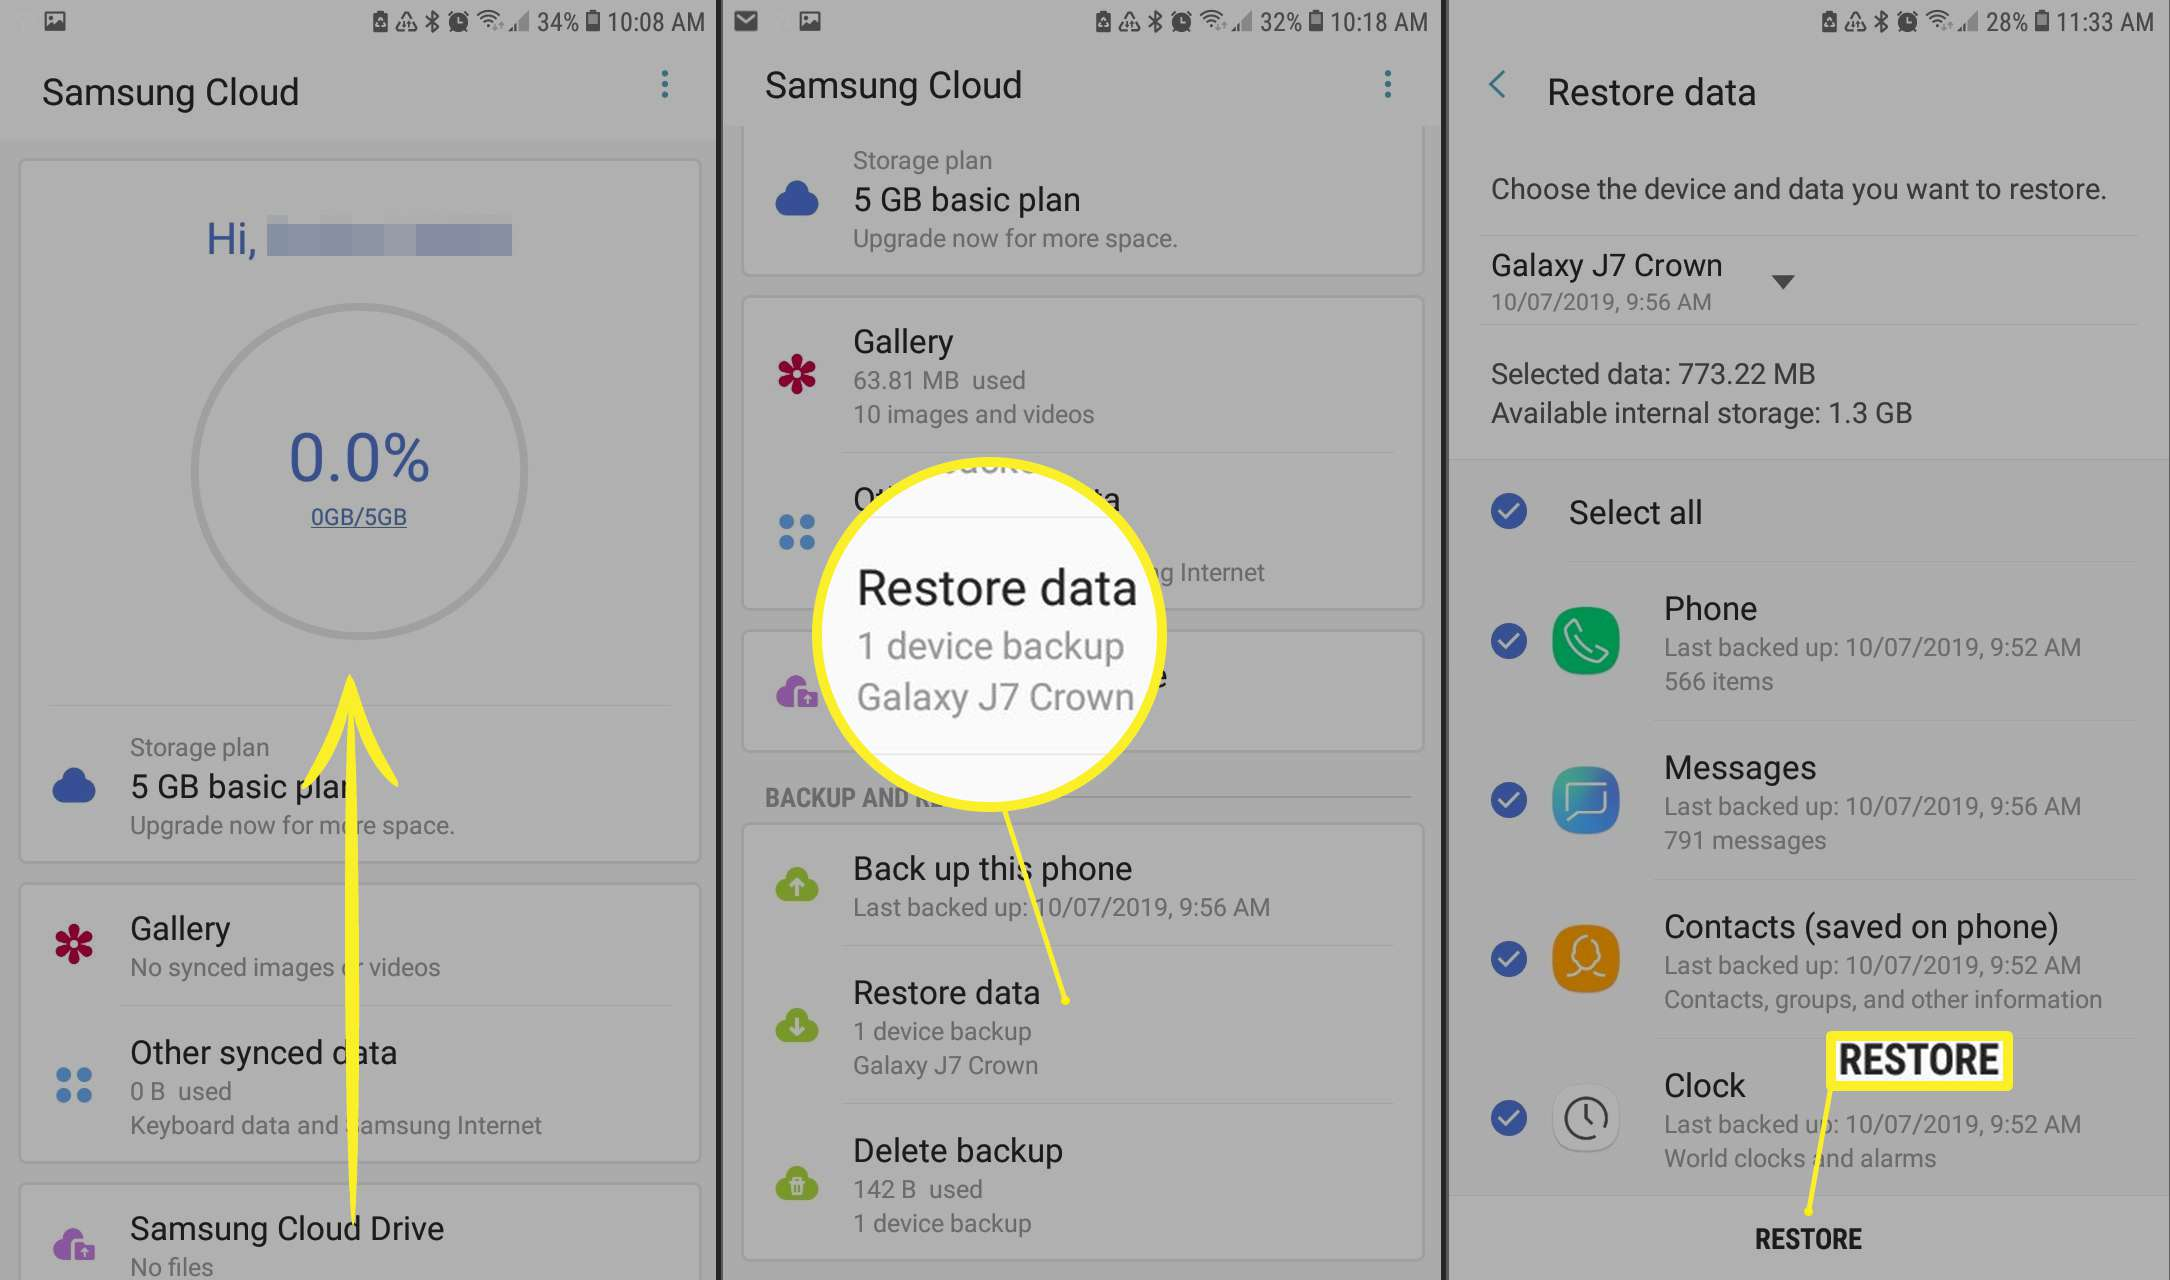 Restoring data in Samsung Cloud